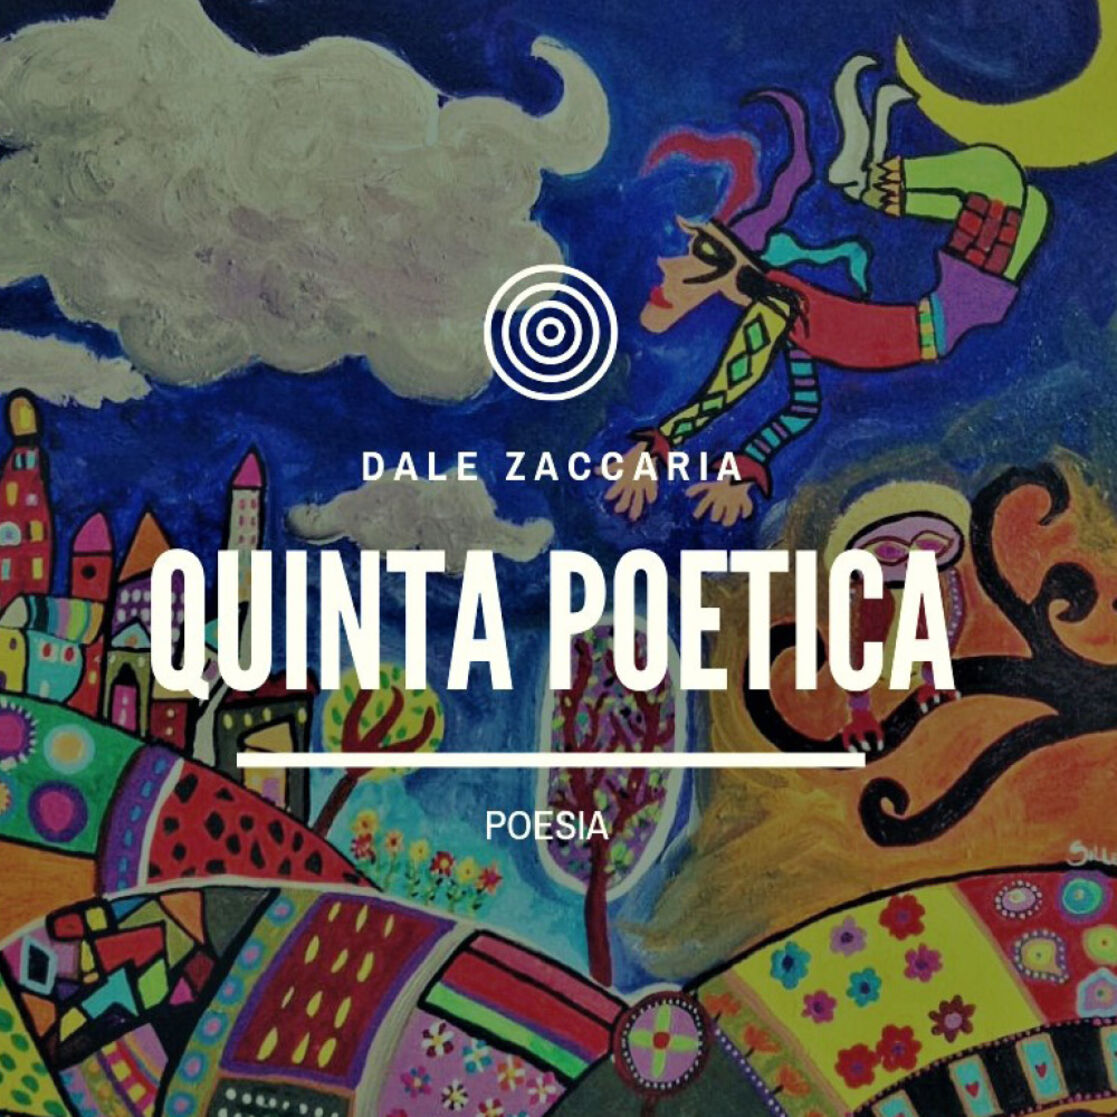 Quinta poetica